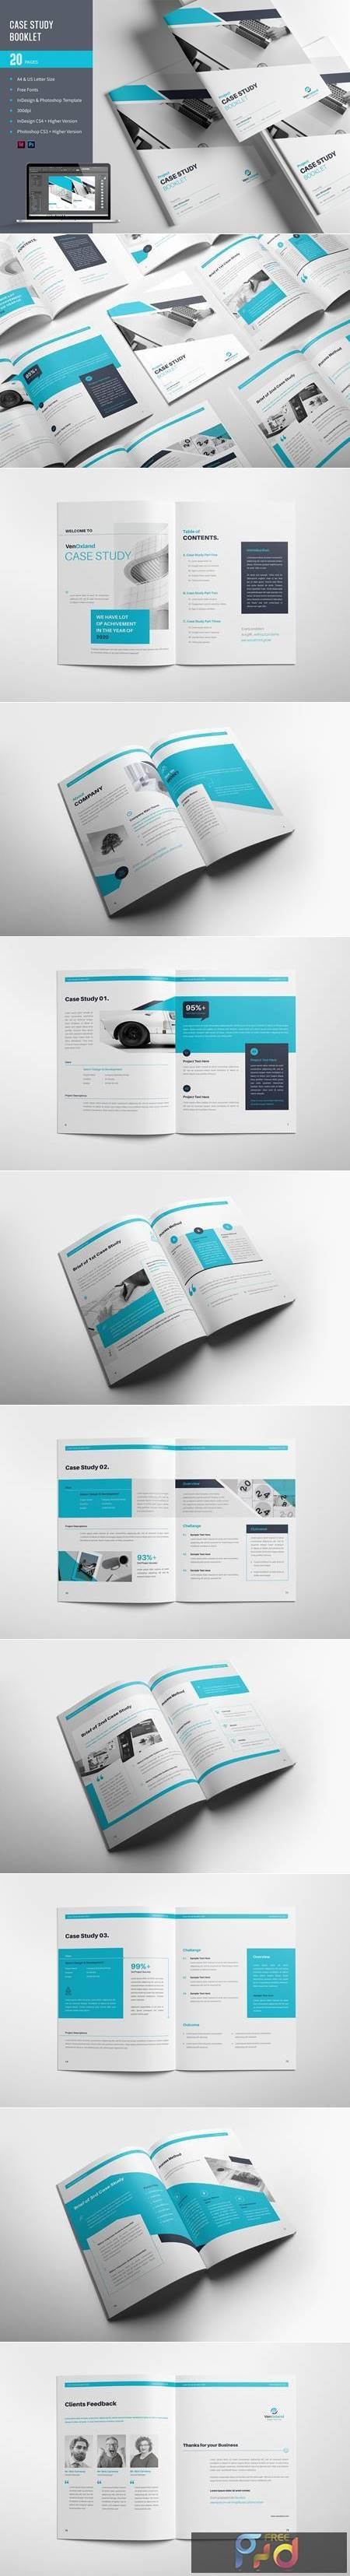 Case Study Booklet 5497849 1